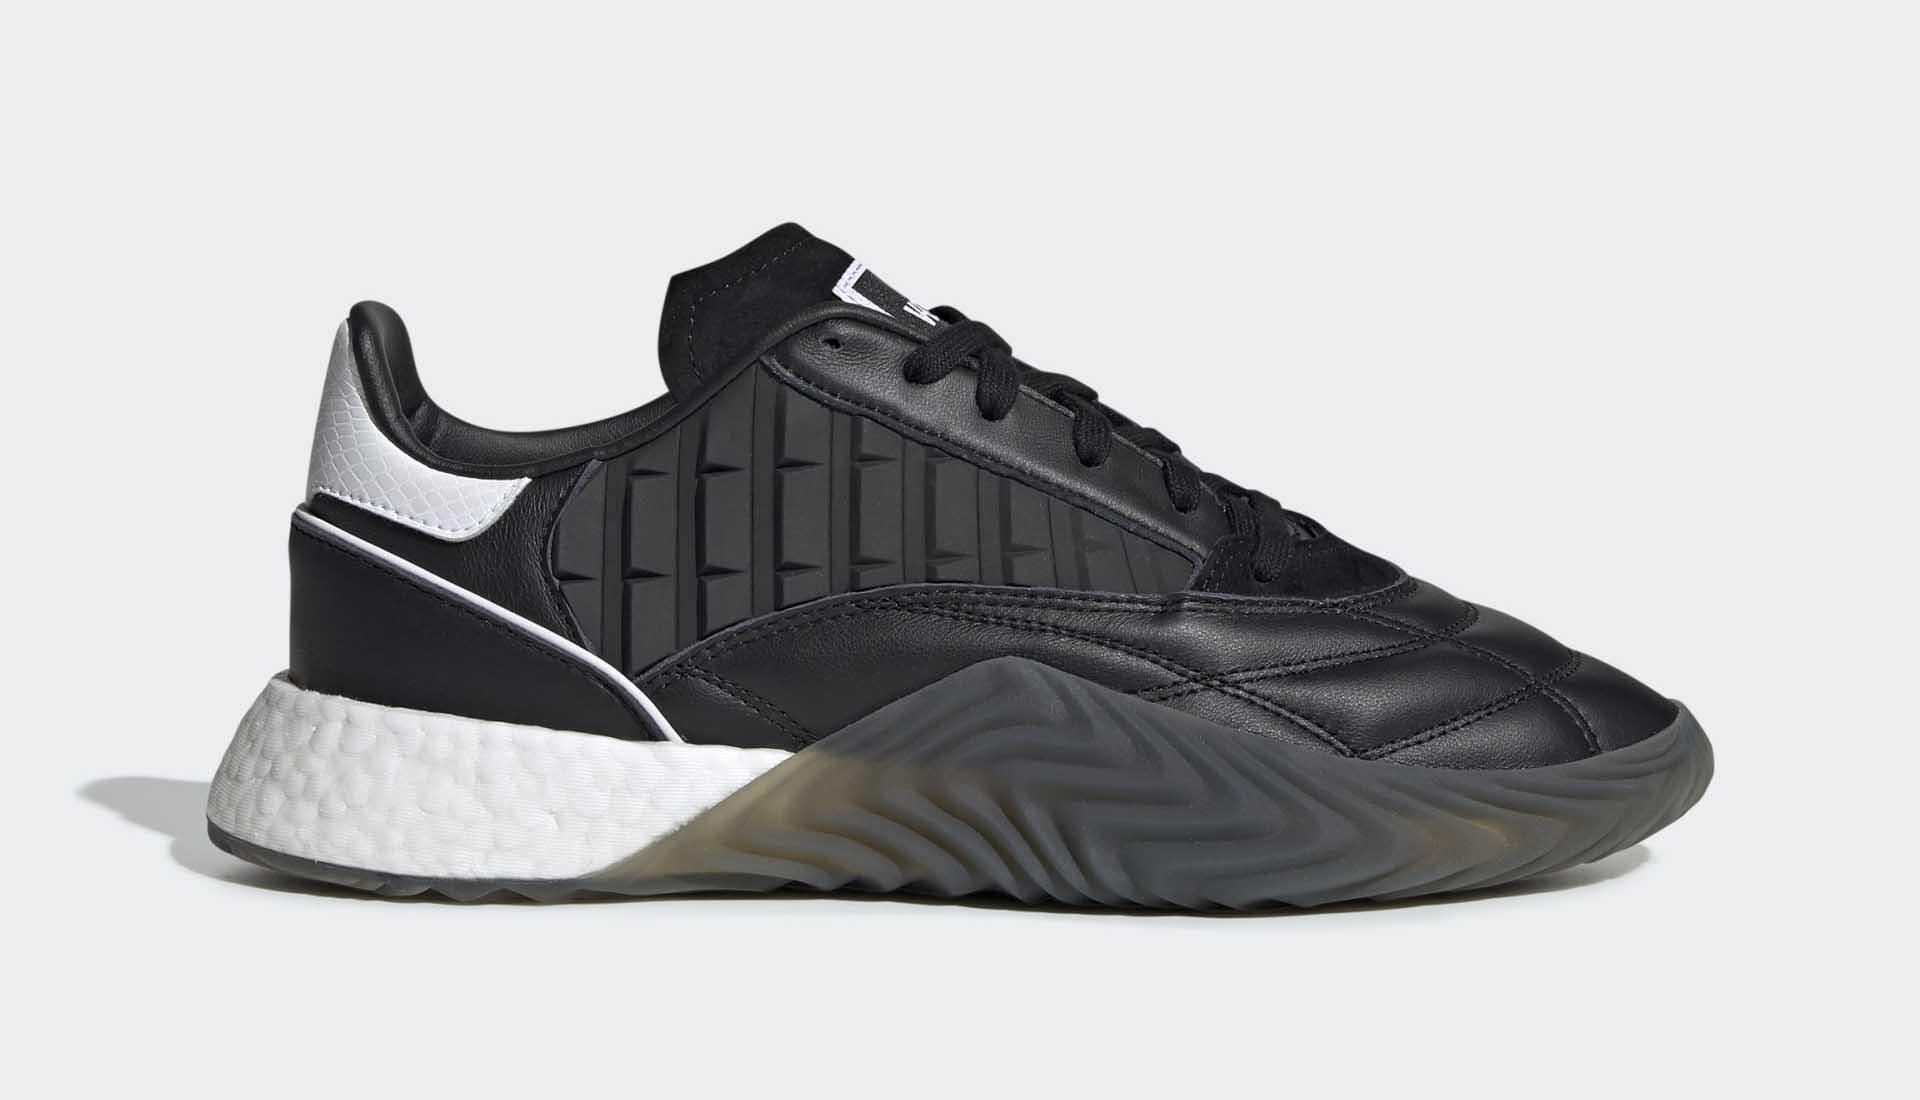 adidas Launch 1994 Predator-Inspired